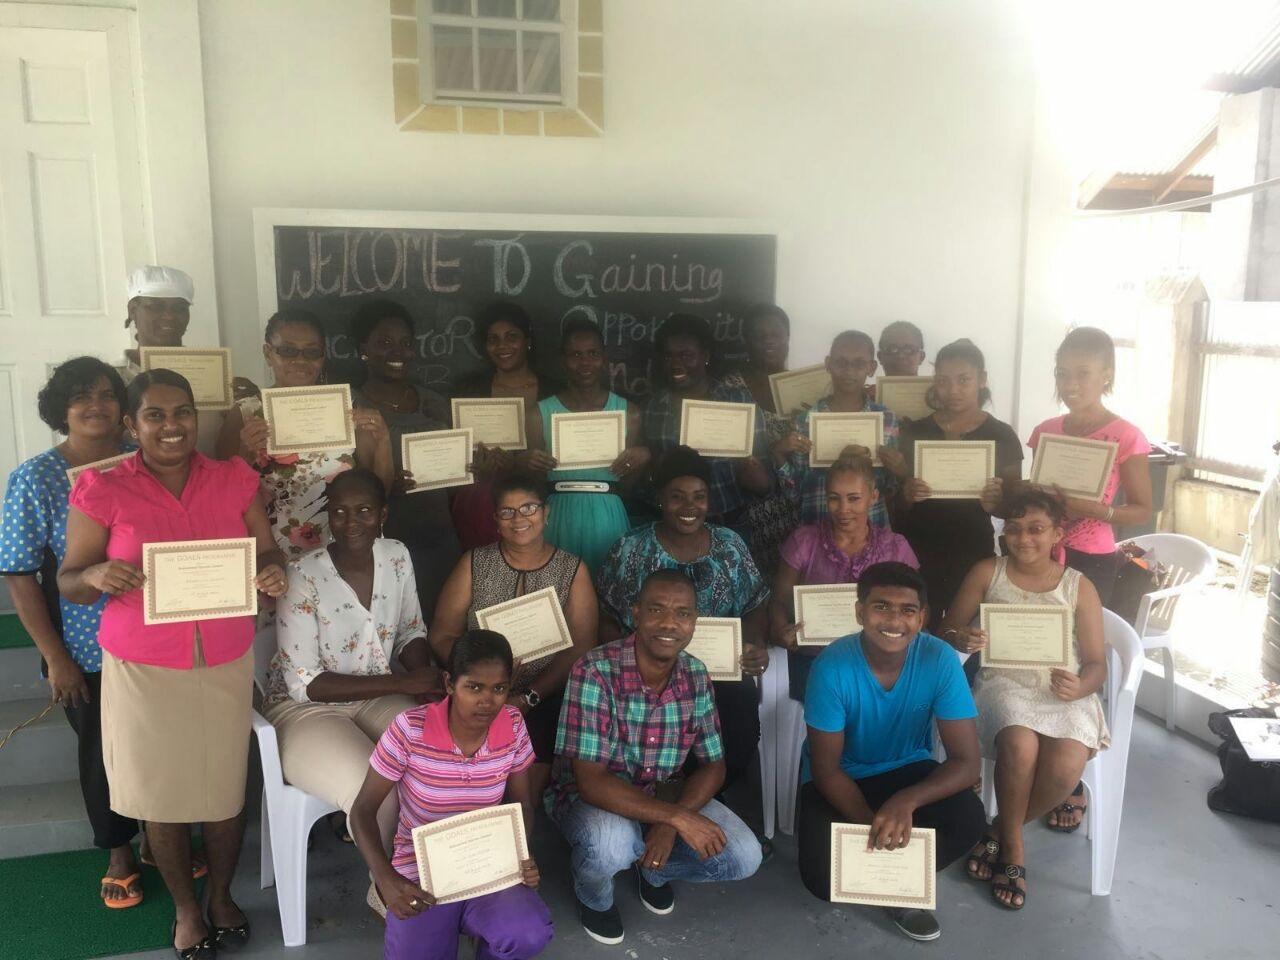 Participants of the GOALS program